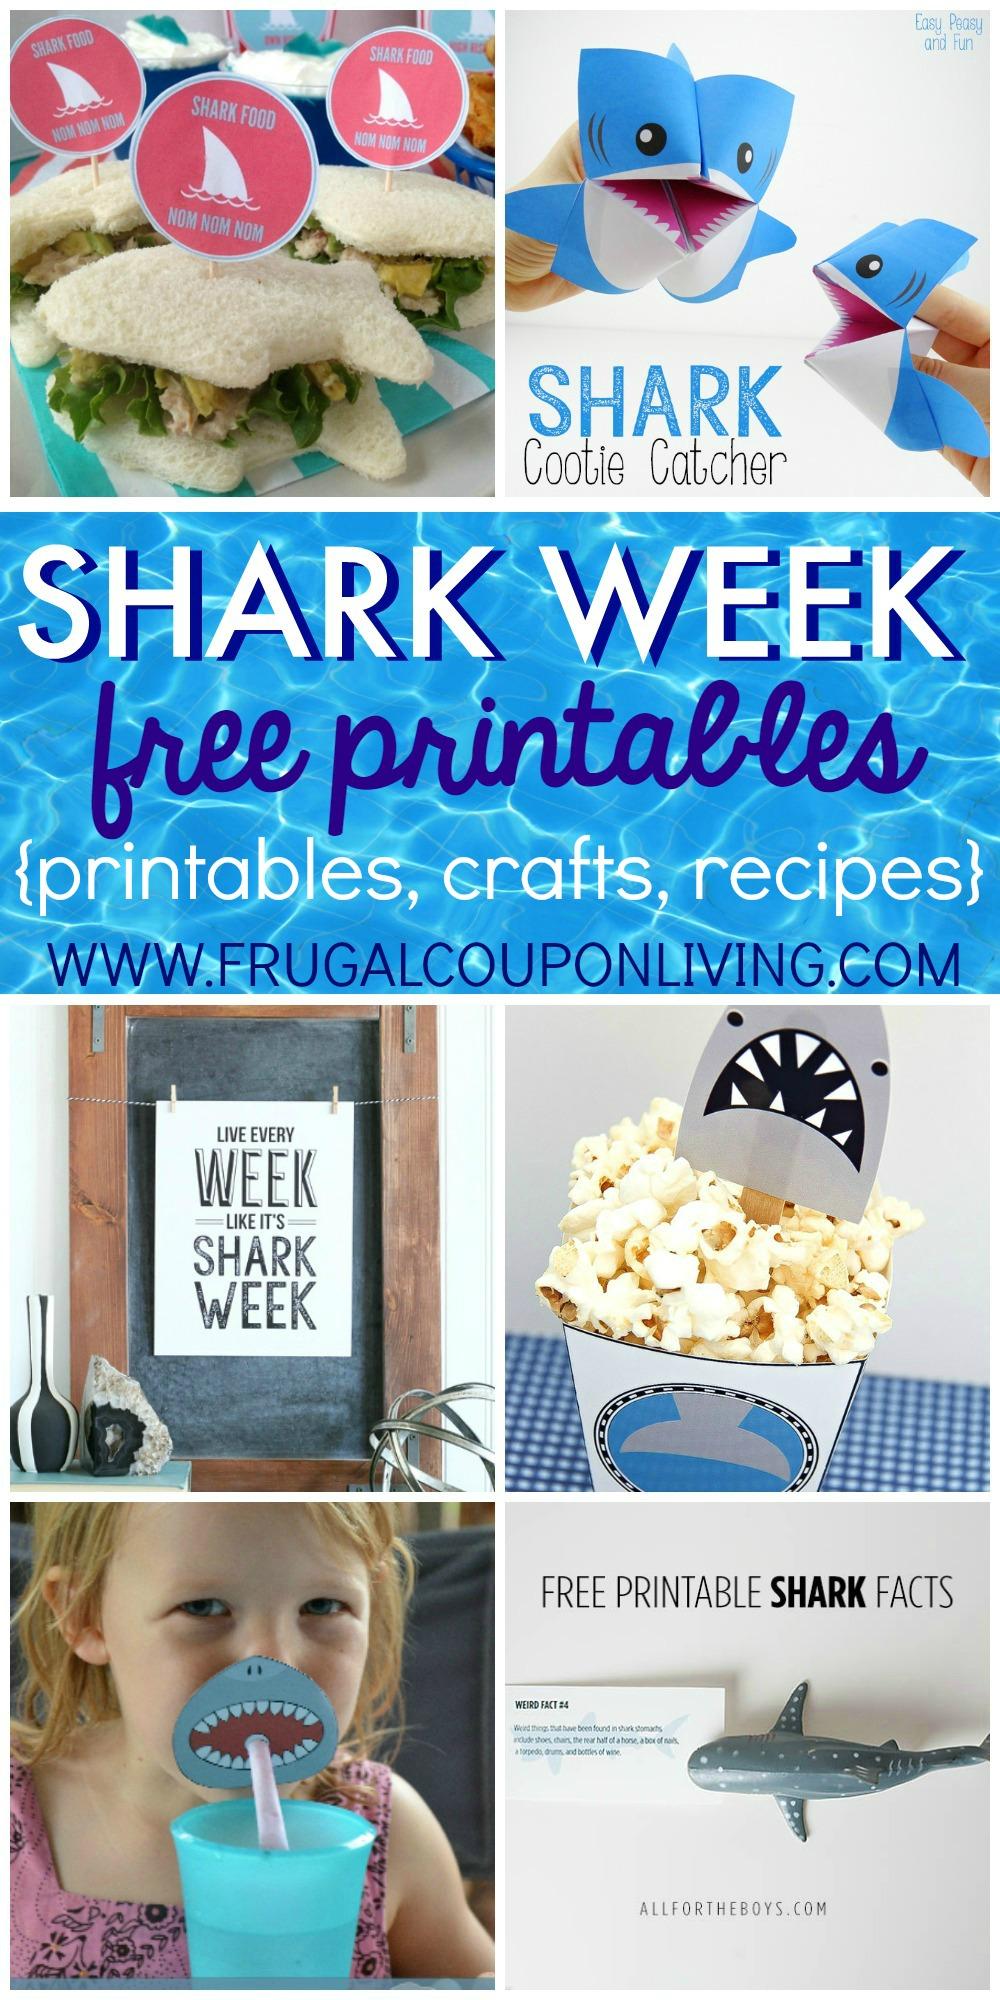 shark-printables-collage-Frugal-coupon-living